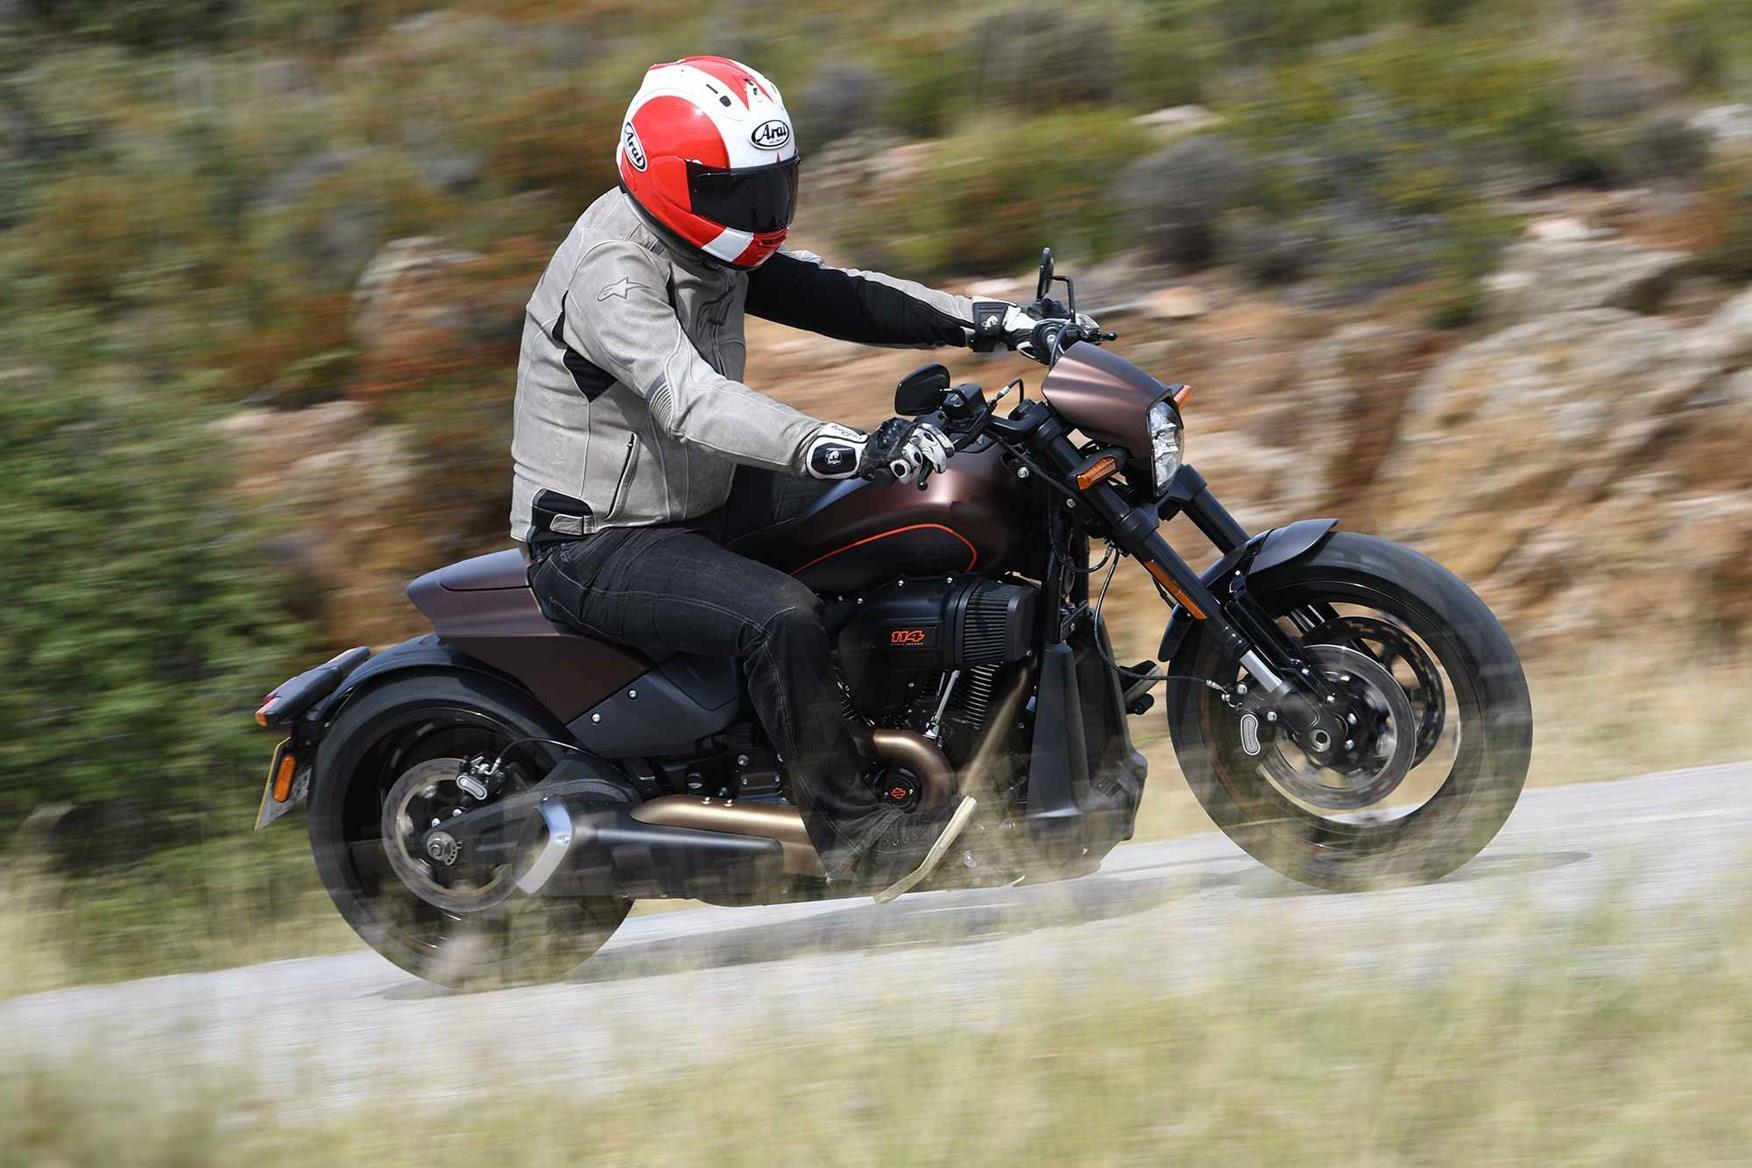 Sold! The five-millionth Harley-Davidson